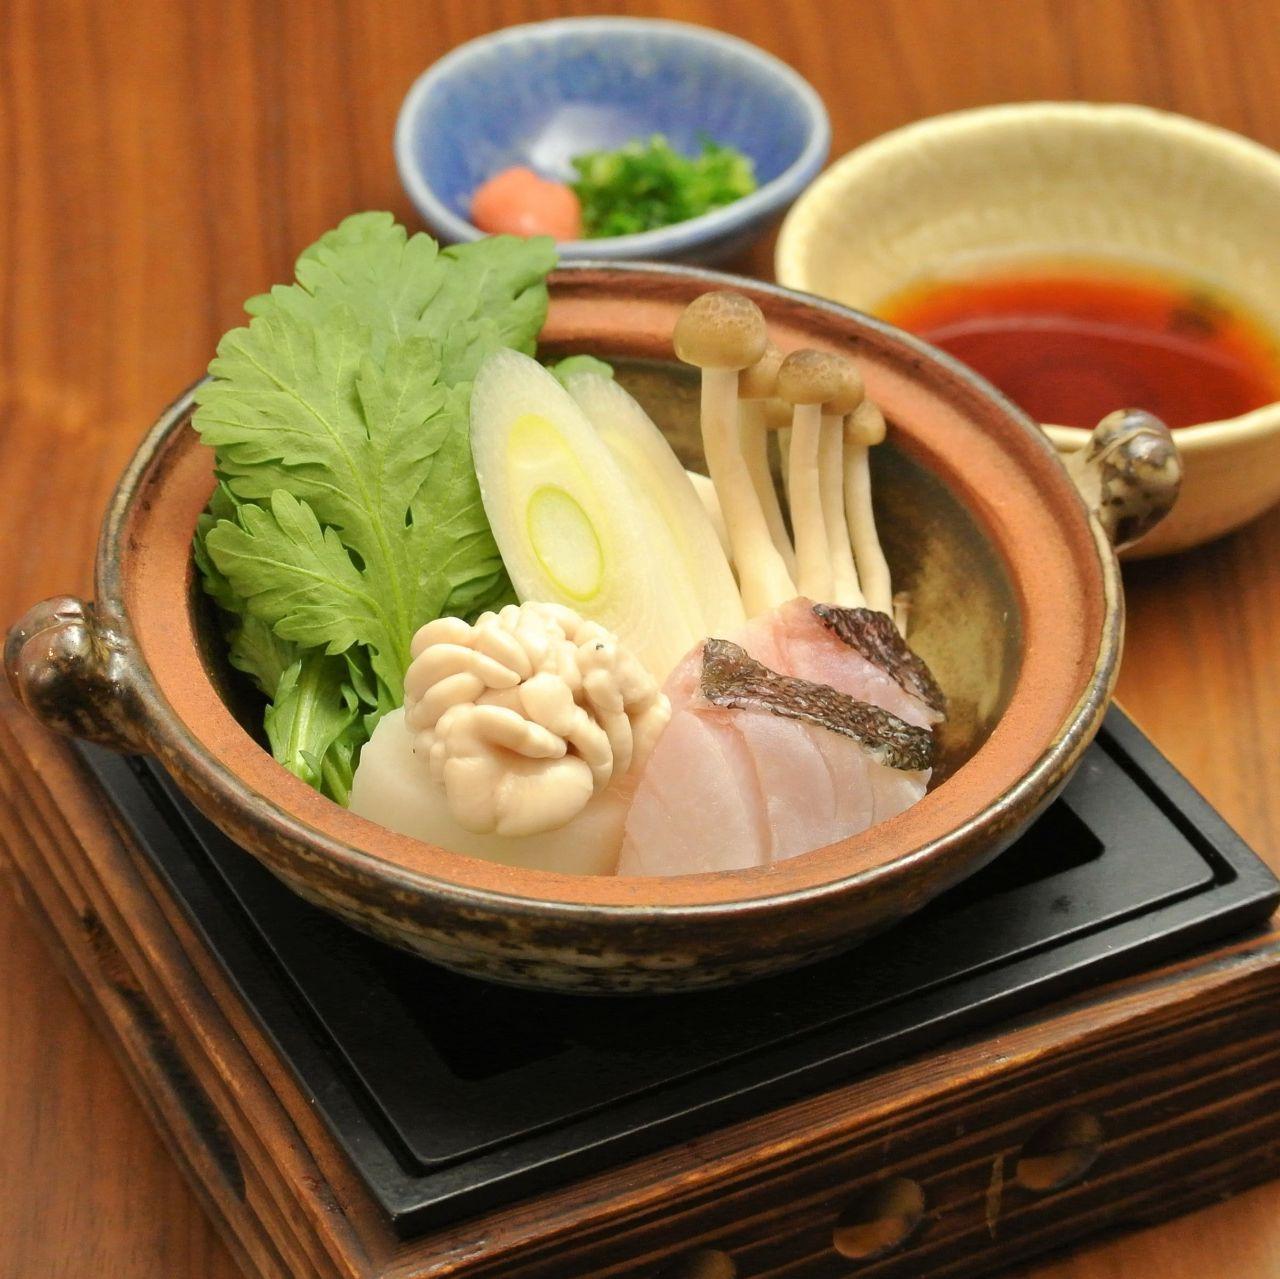 旬の食材 北海道産 真鱈